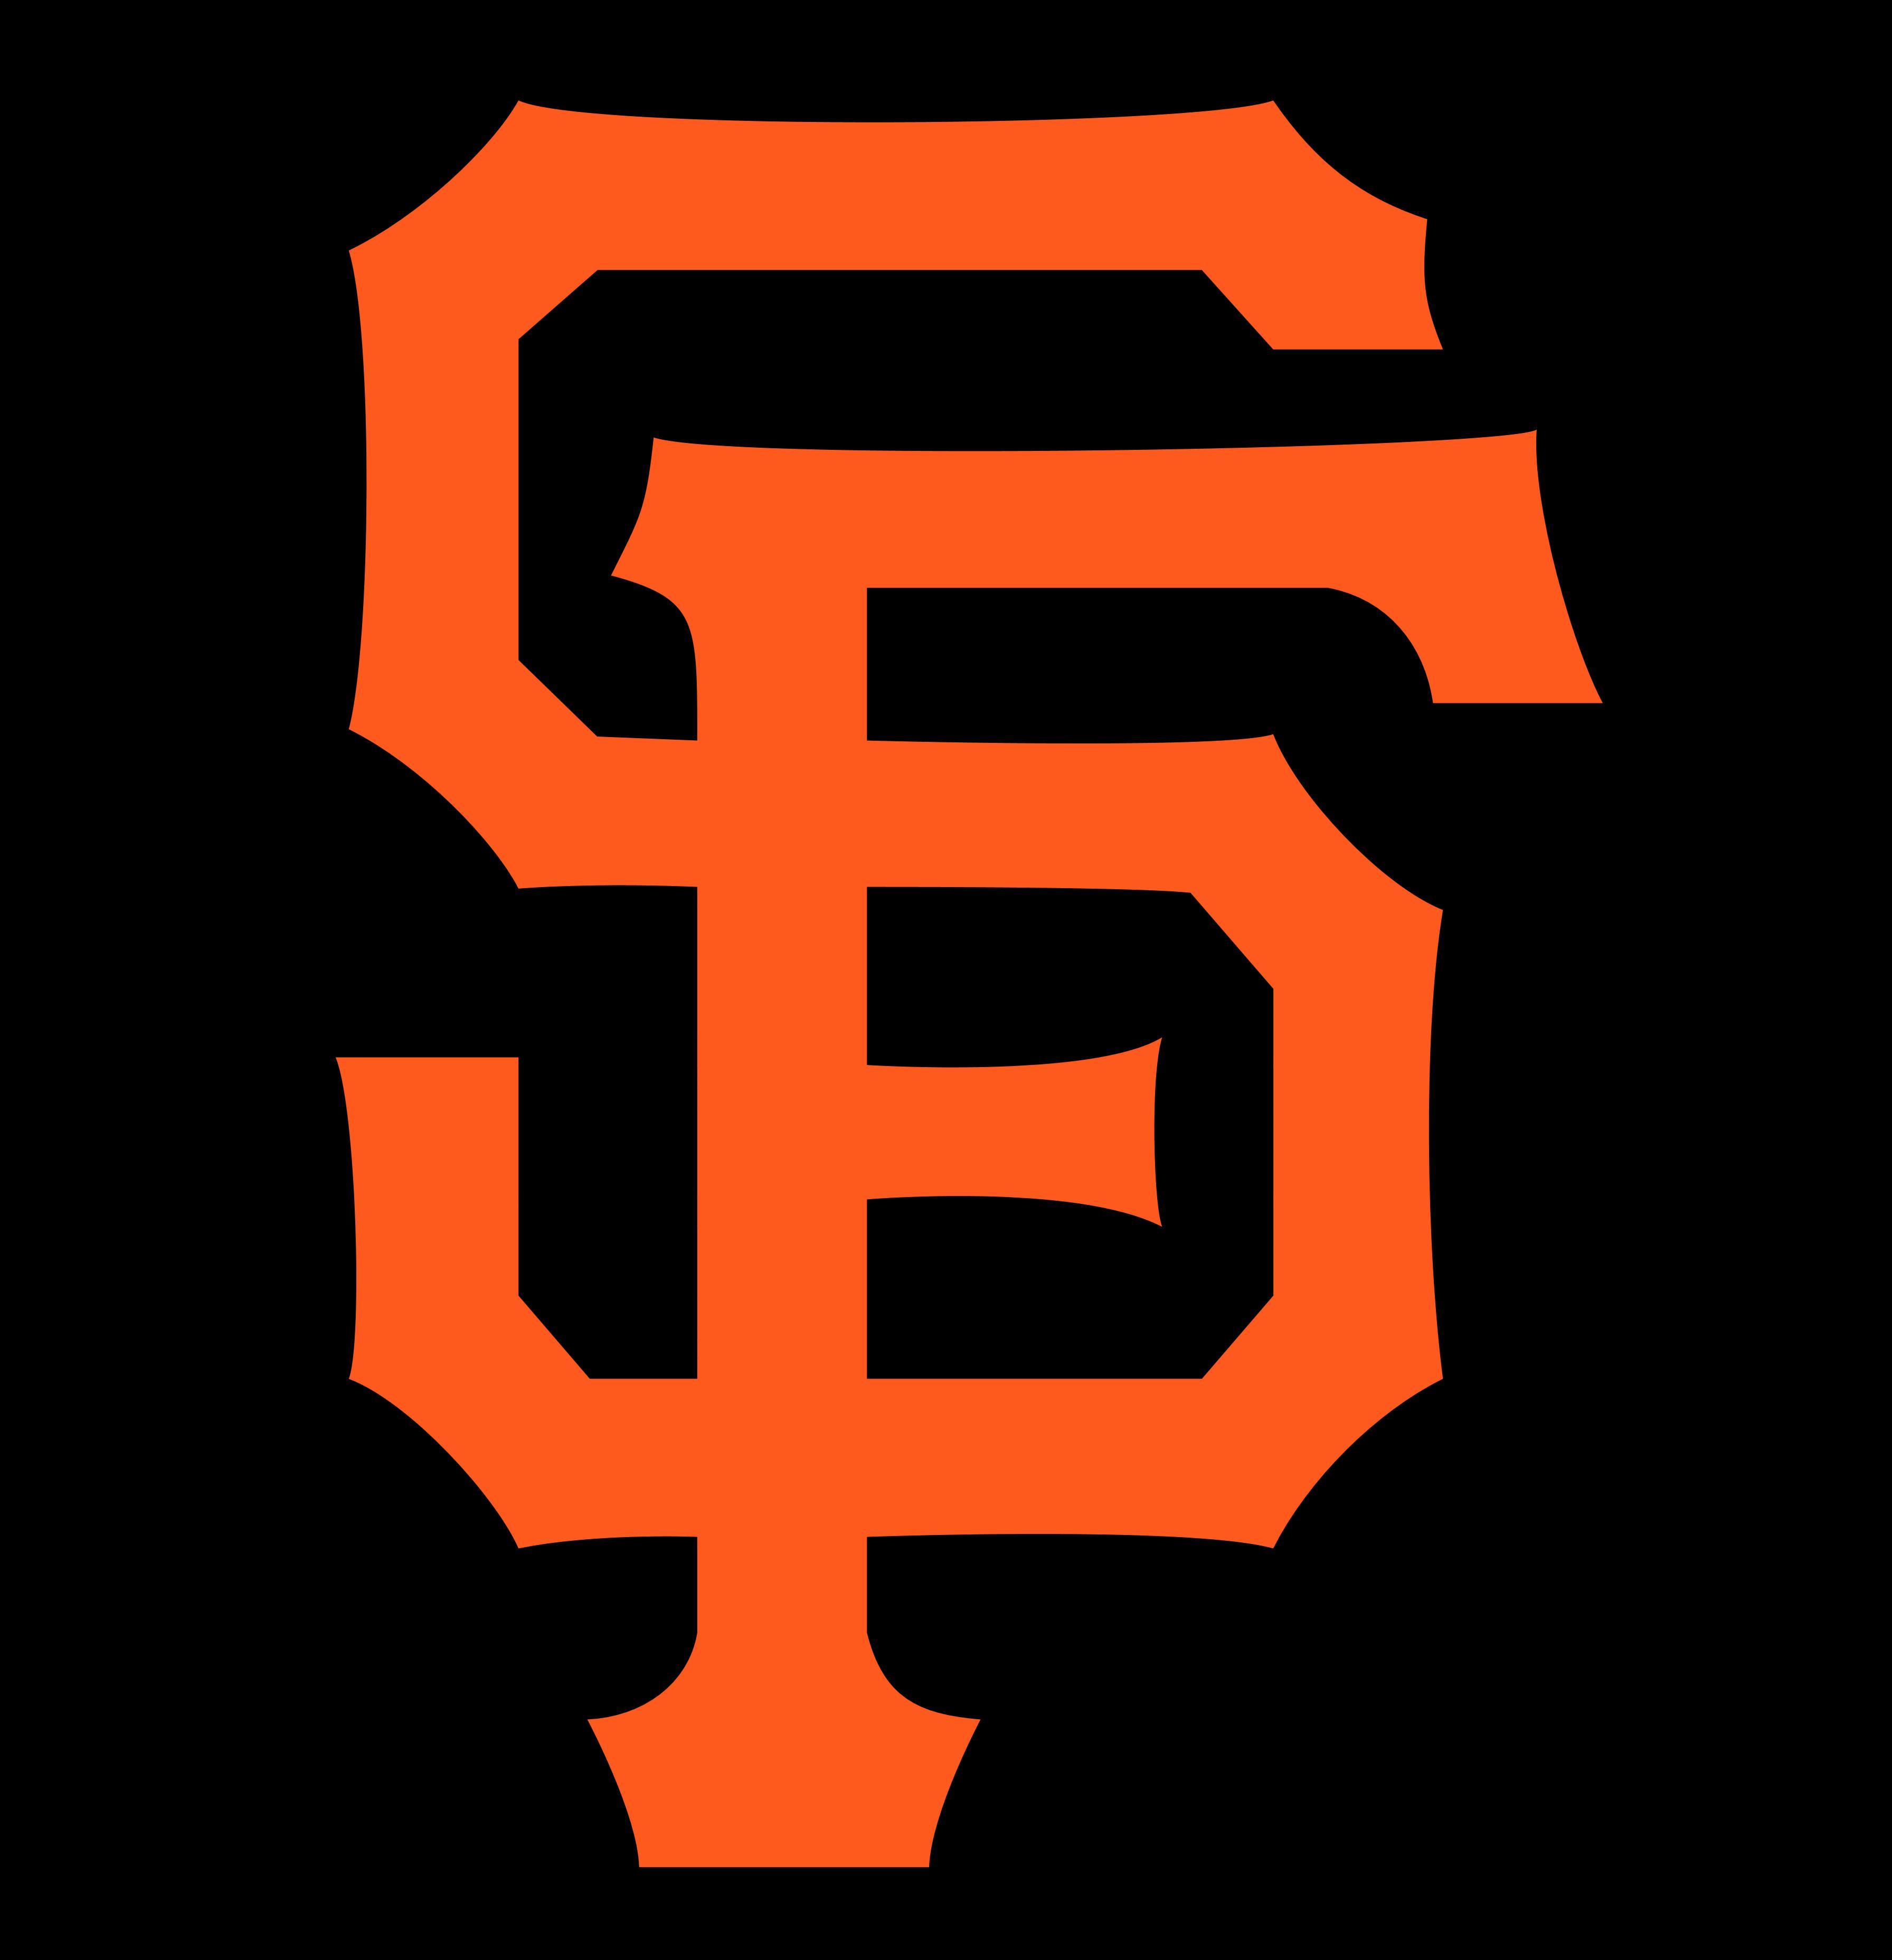 San Francisco Giants – Logos Download   3584 x 3712 png 153kB